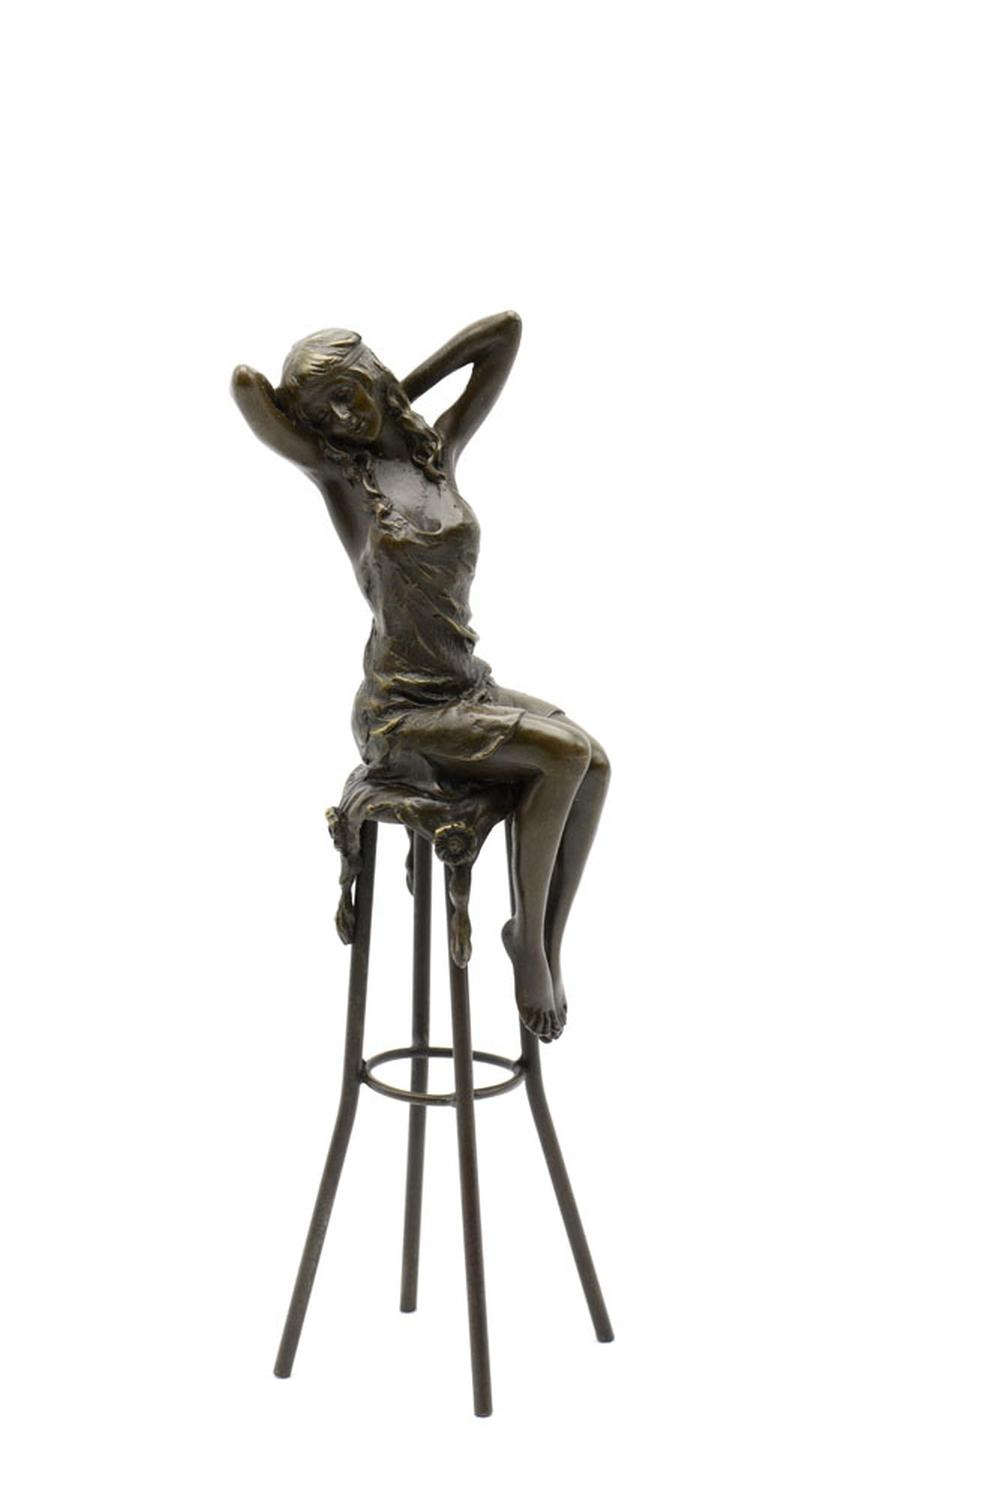 Figura feminina sentada, Esc. em bronze